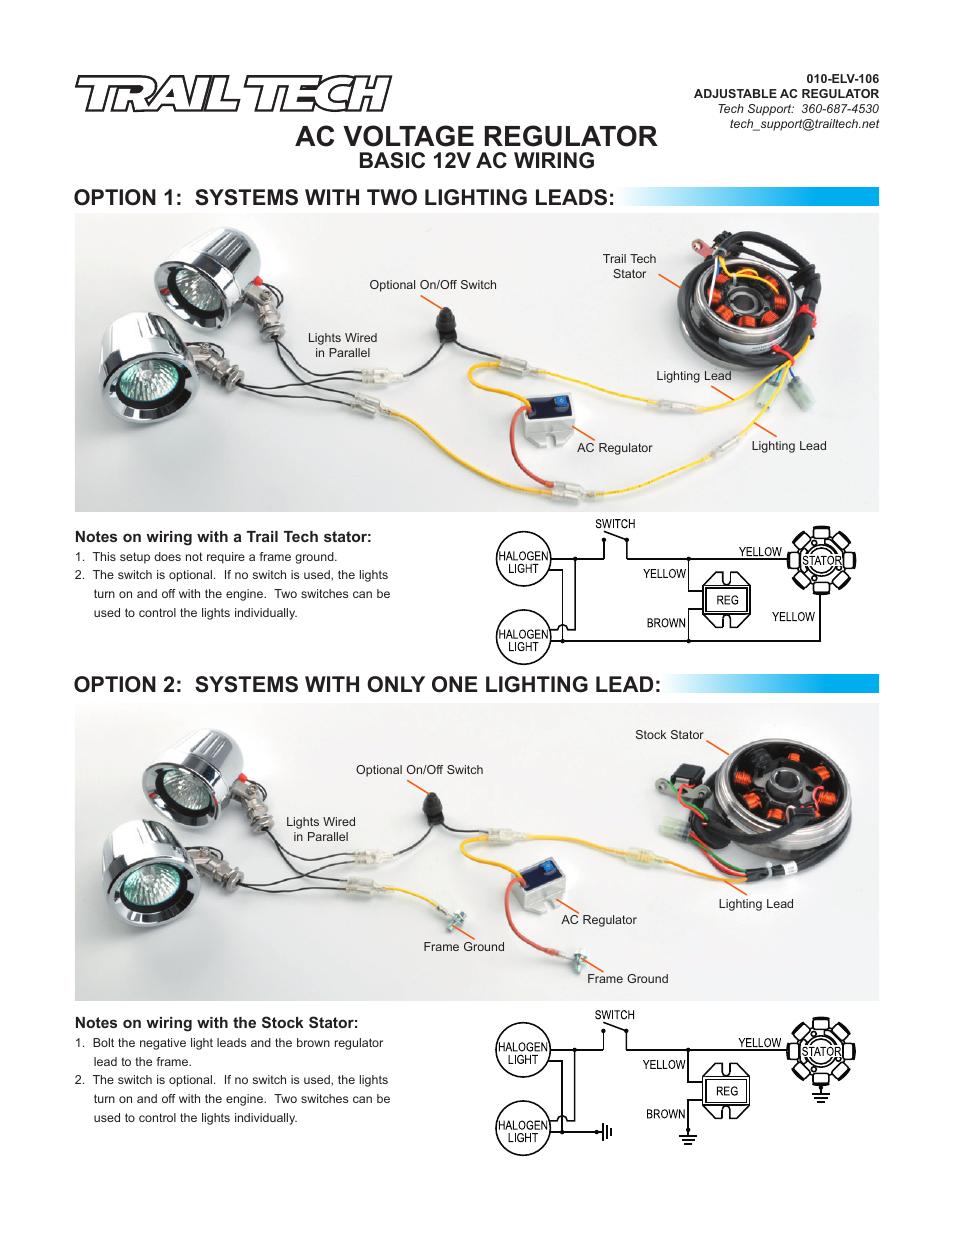 Trail Tech Ac Voltage Regulator 7003 Ac01 User Manual 2